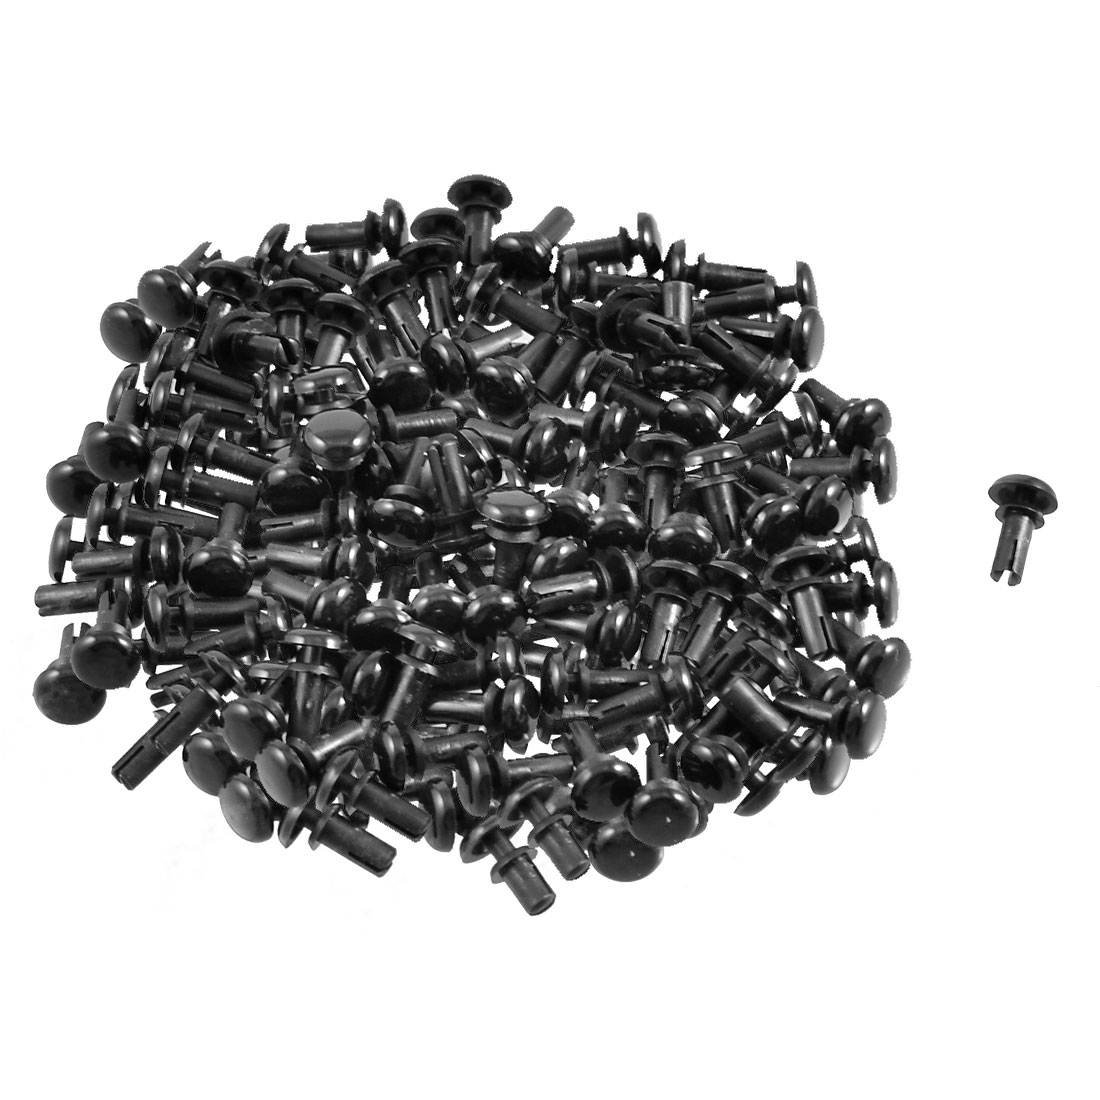 200 Pcs Black Nylon 3.0mm Bottom Dia Push Clips Rivets Fasteners R3065